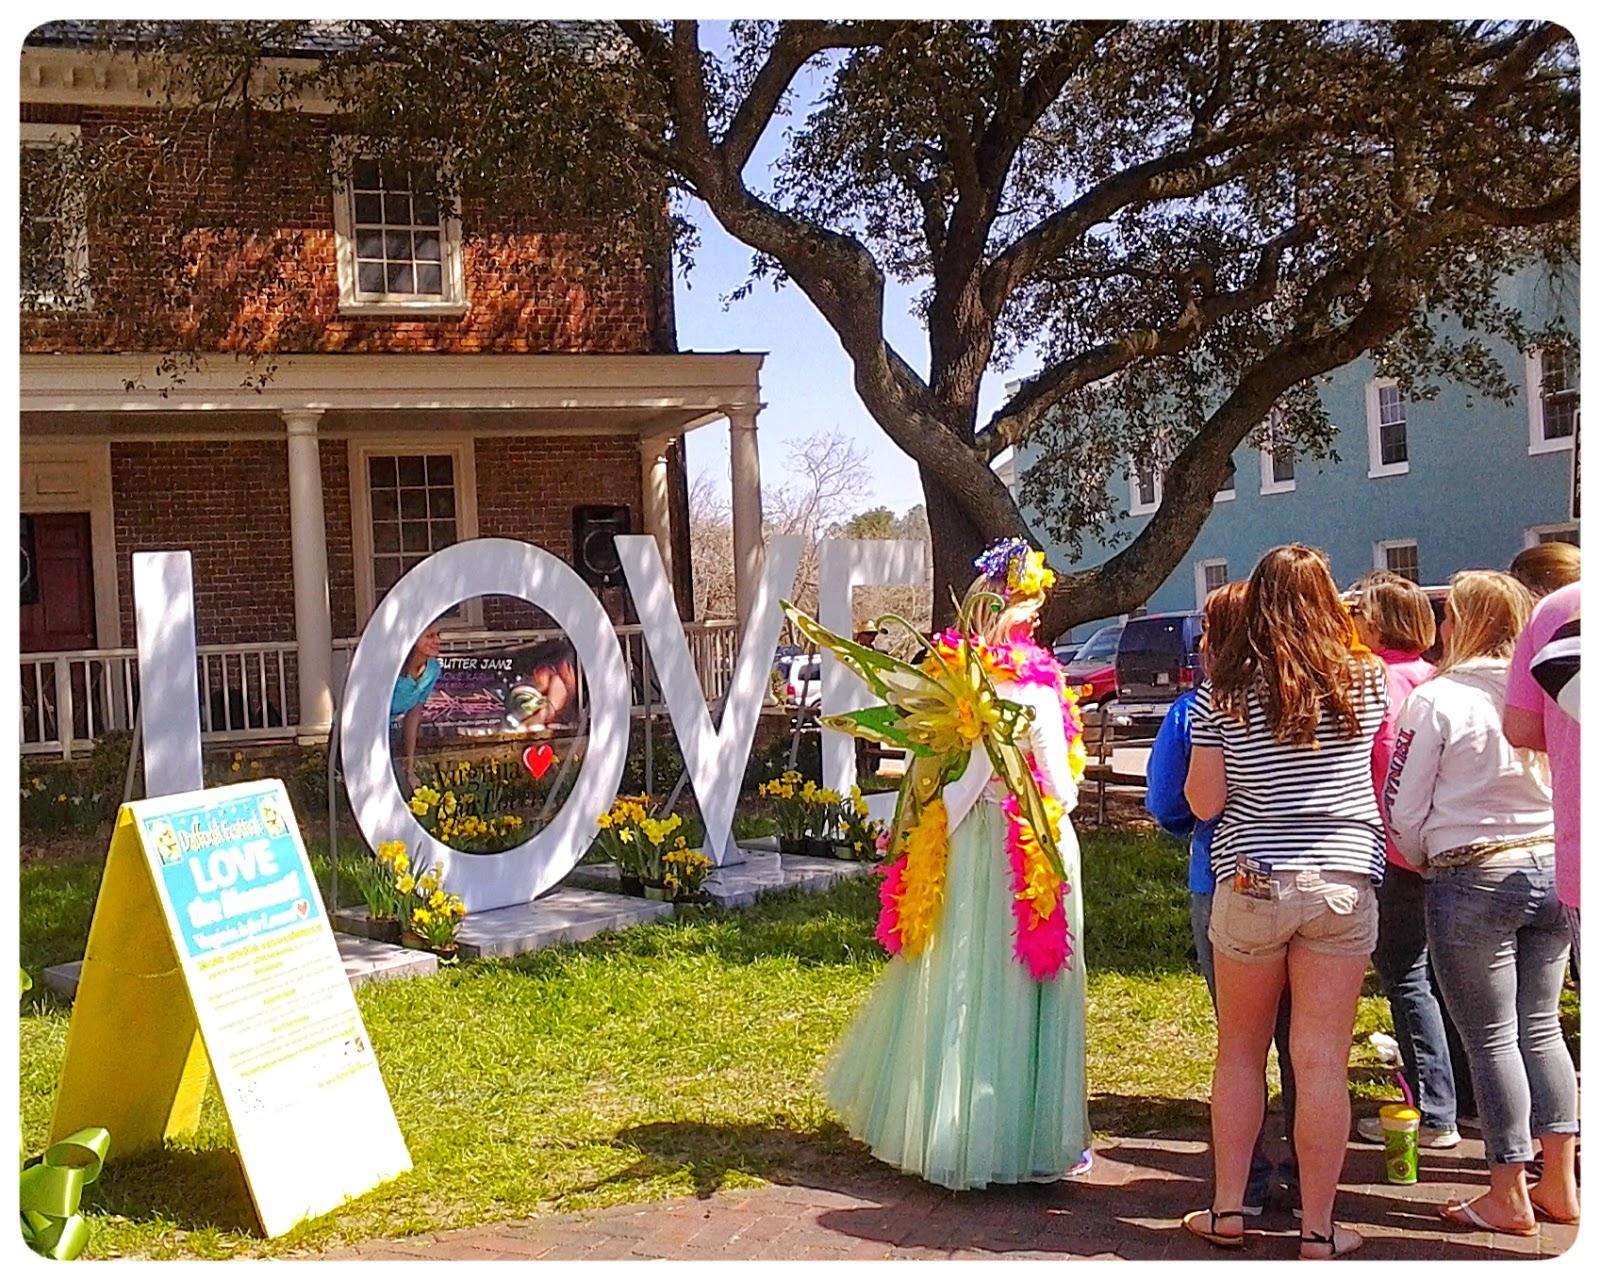 Virginia is for Lovers Sign at 28th Annual Gloucester Daffodil Festival via foobella.blogspot.com